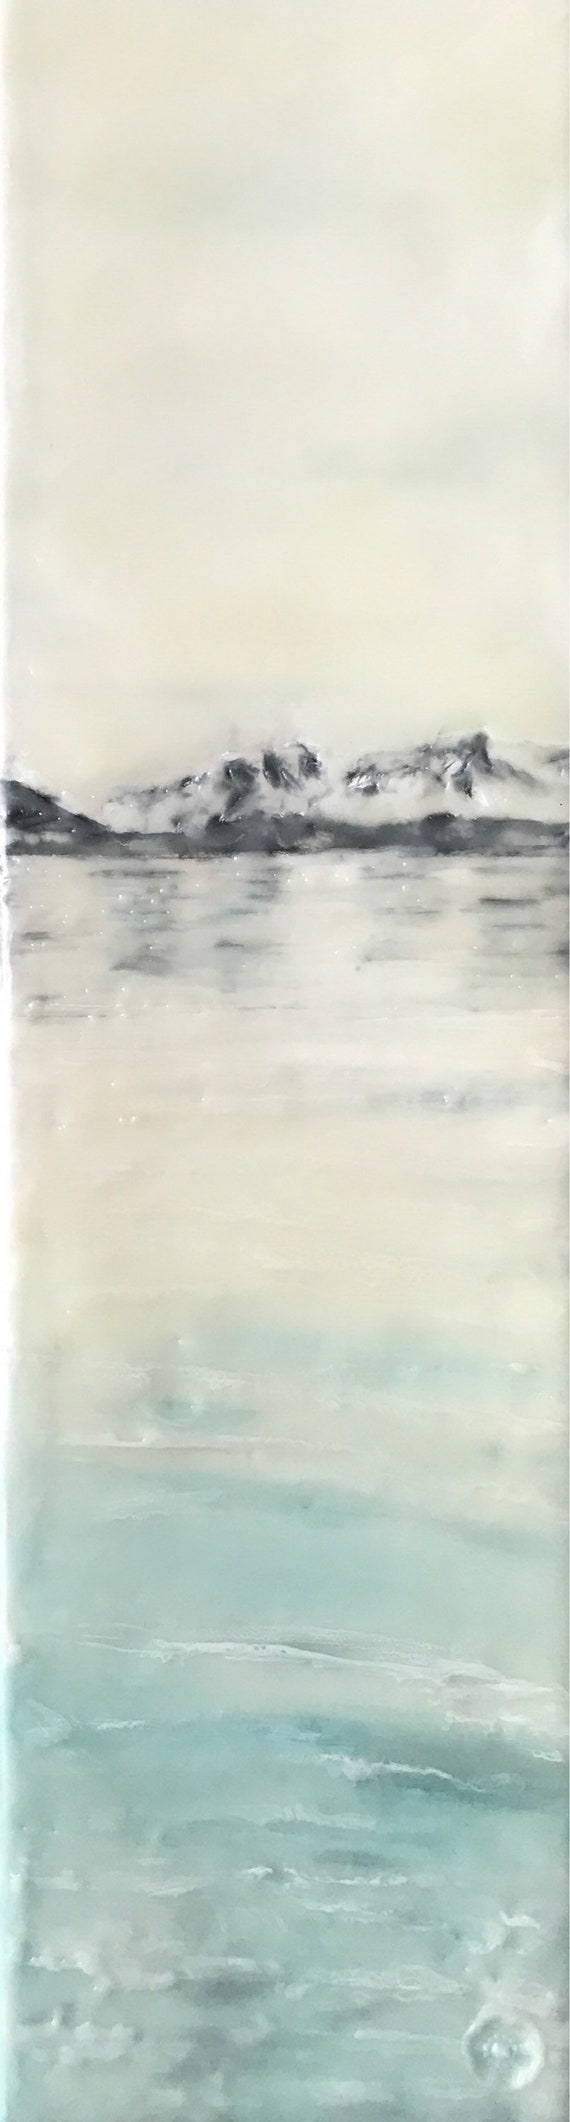 https://www.etsy.com/listing/605334673/winter-reflection-125x35-original